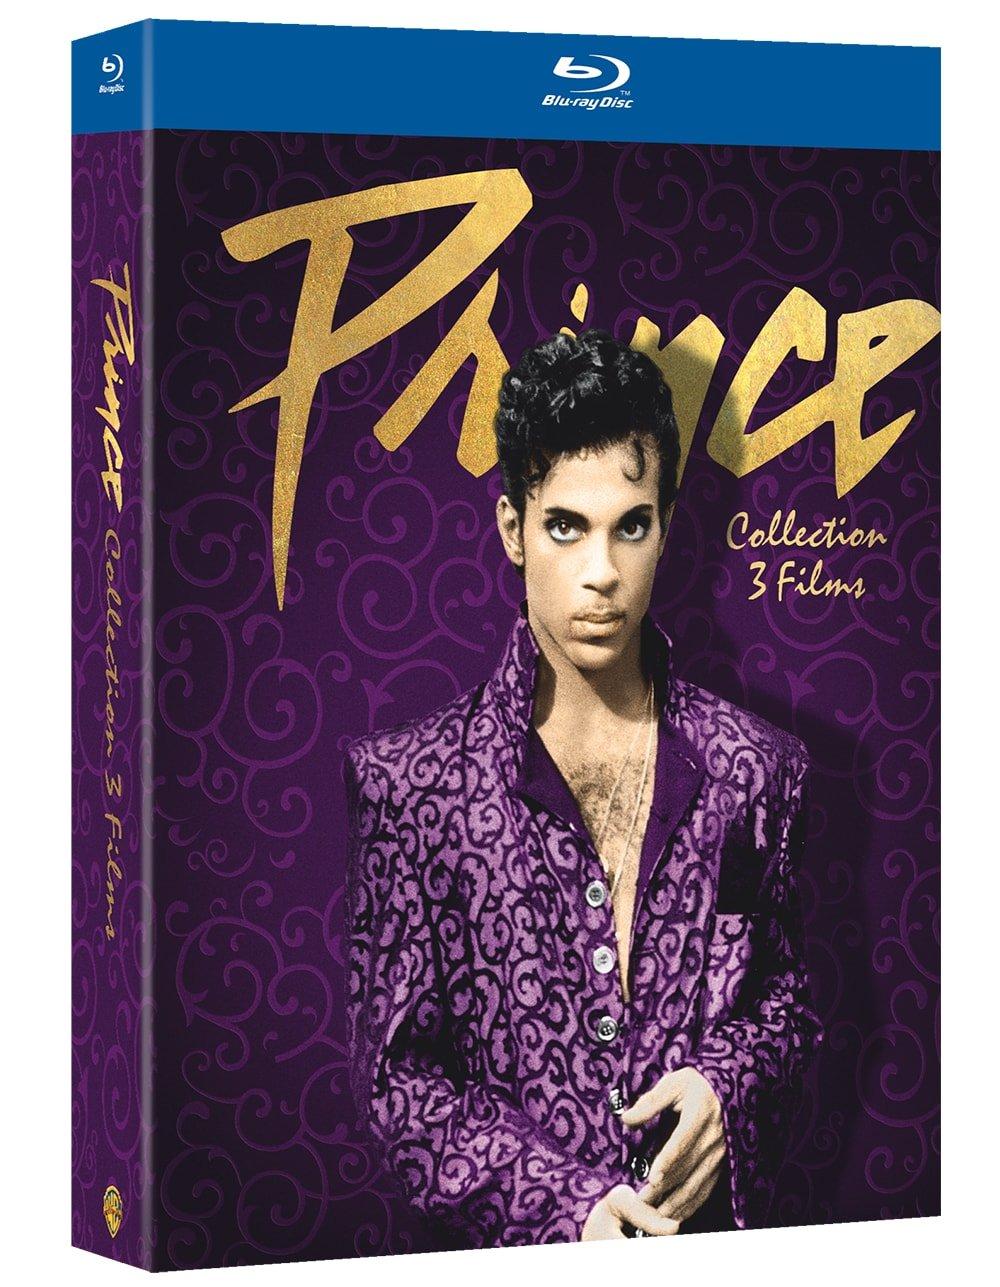 coffret prince warner